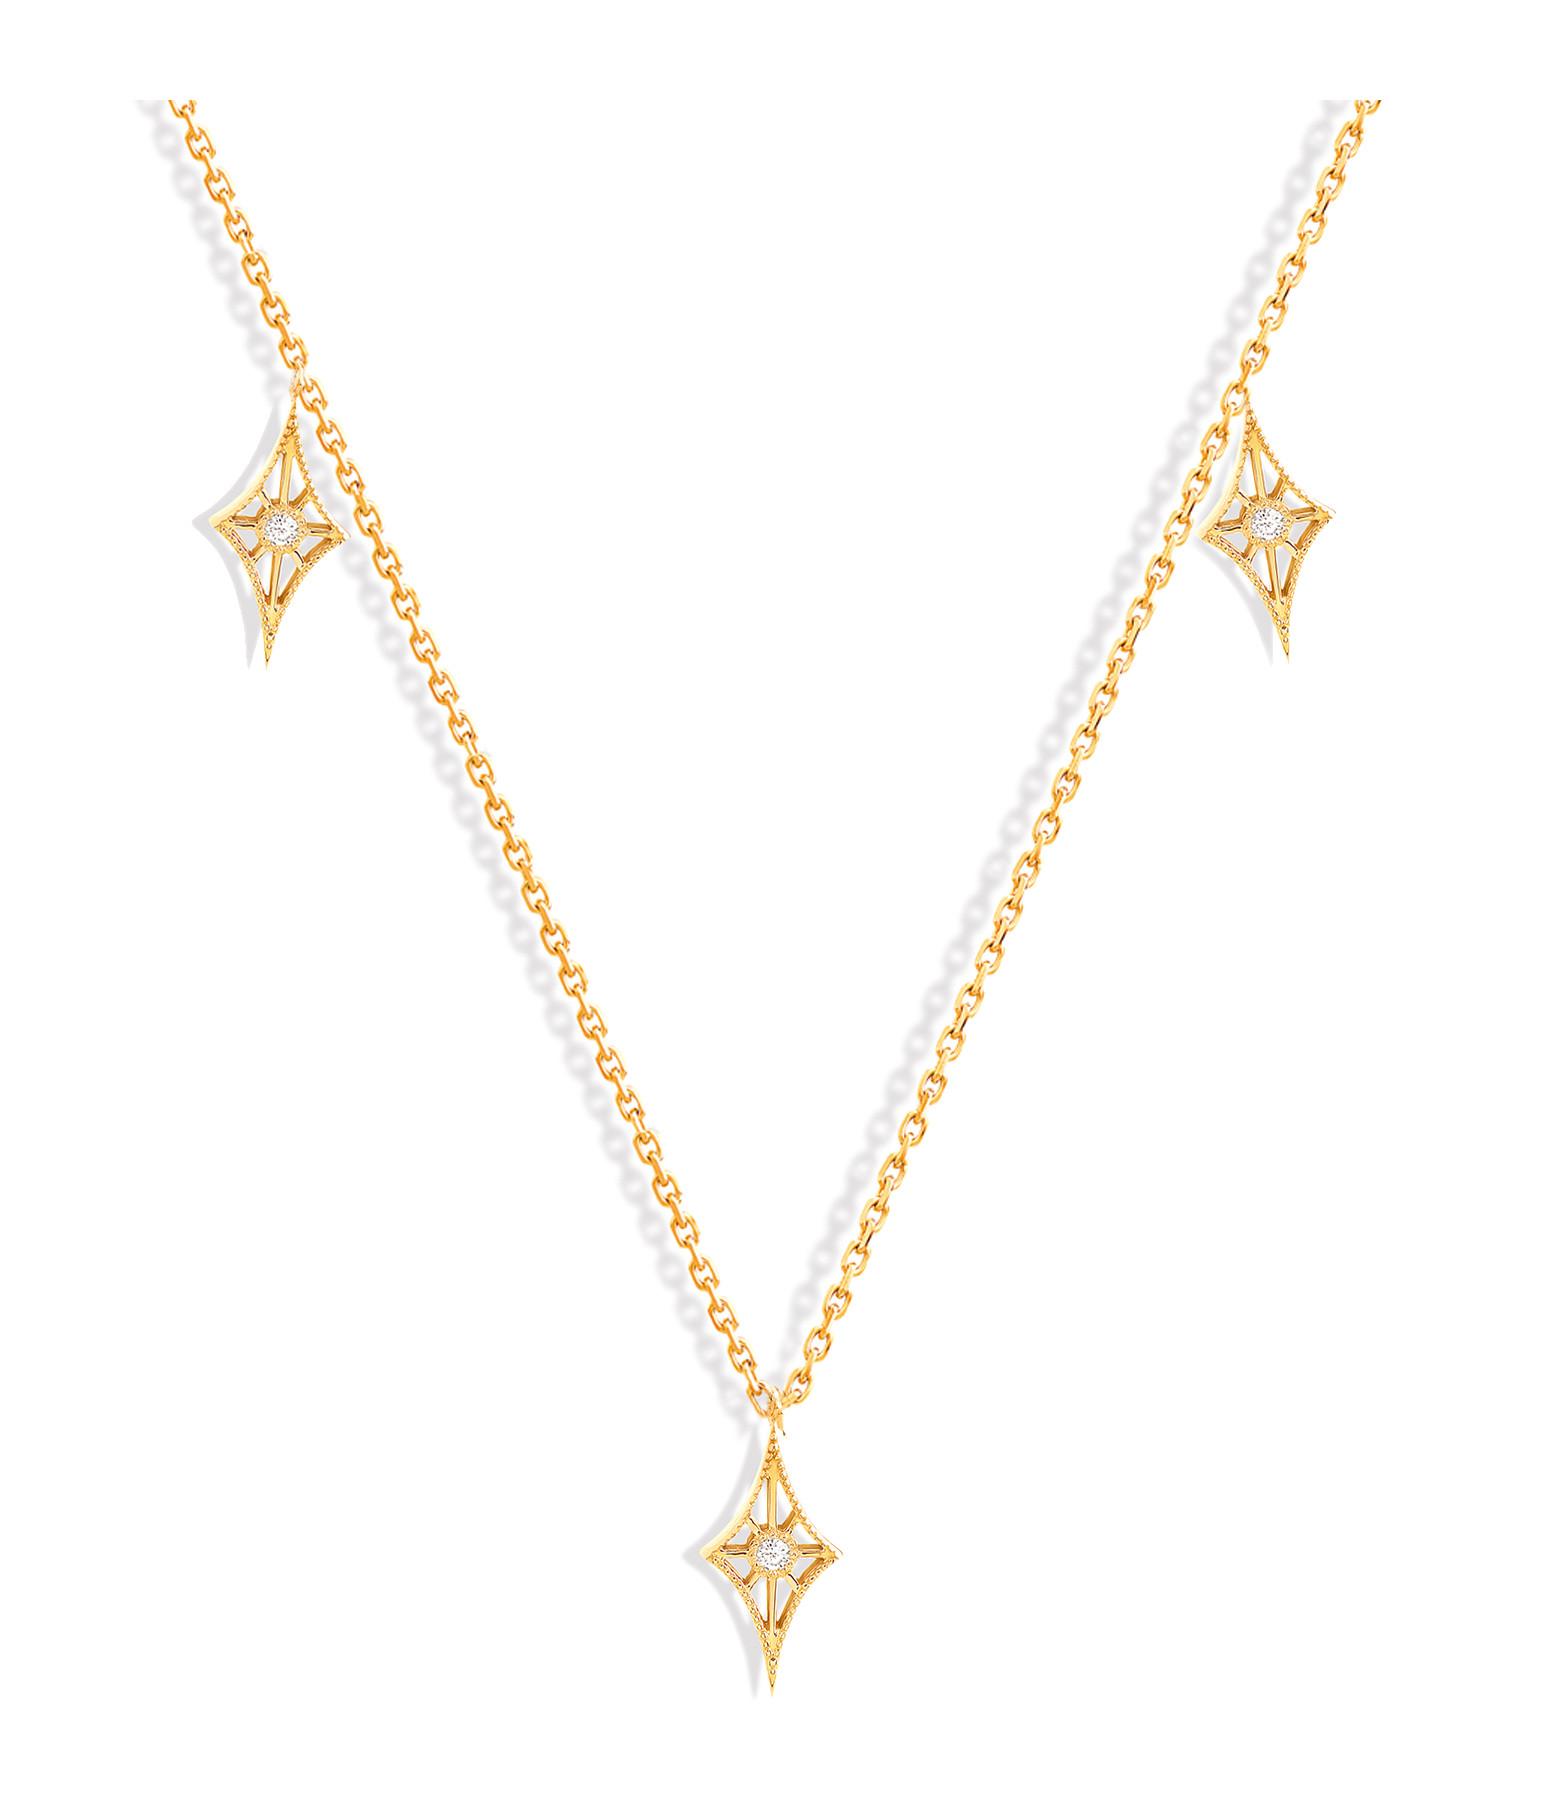 NAVA JOAILLERIE - Collier Cheyenne Mini-Losange Diamants Or Jaune